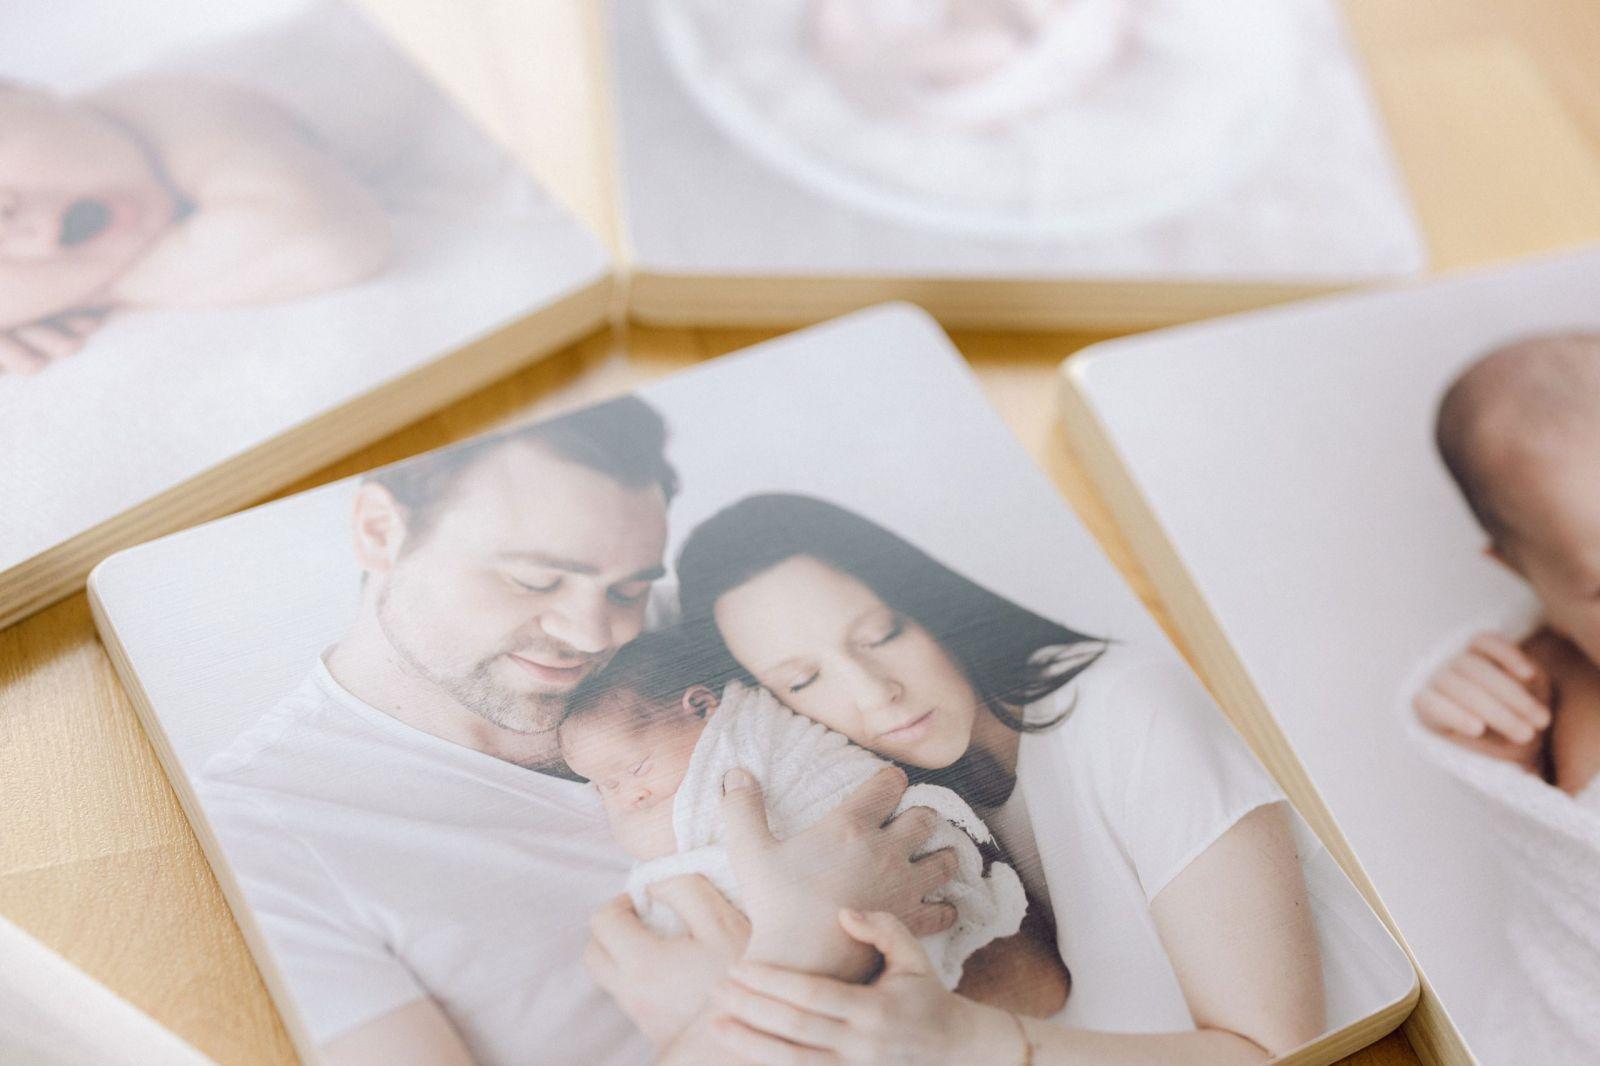 neugeborenenfotos leipzig holzfotos fotoprodukte juliaoehme  scaled